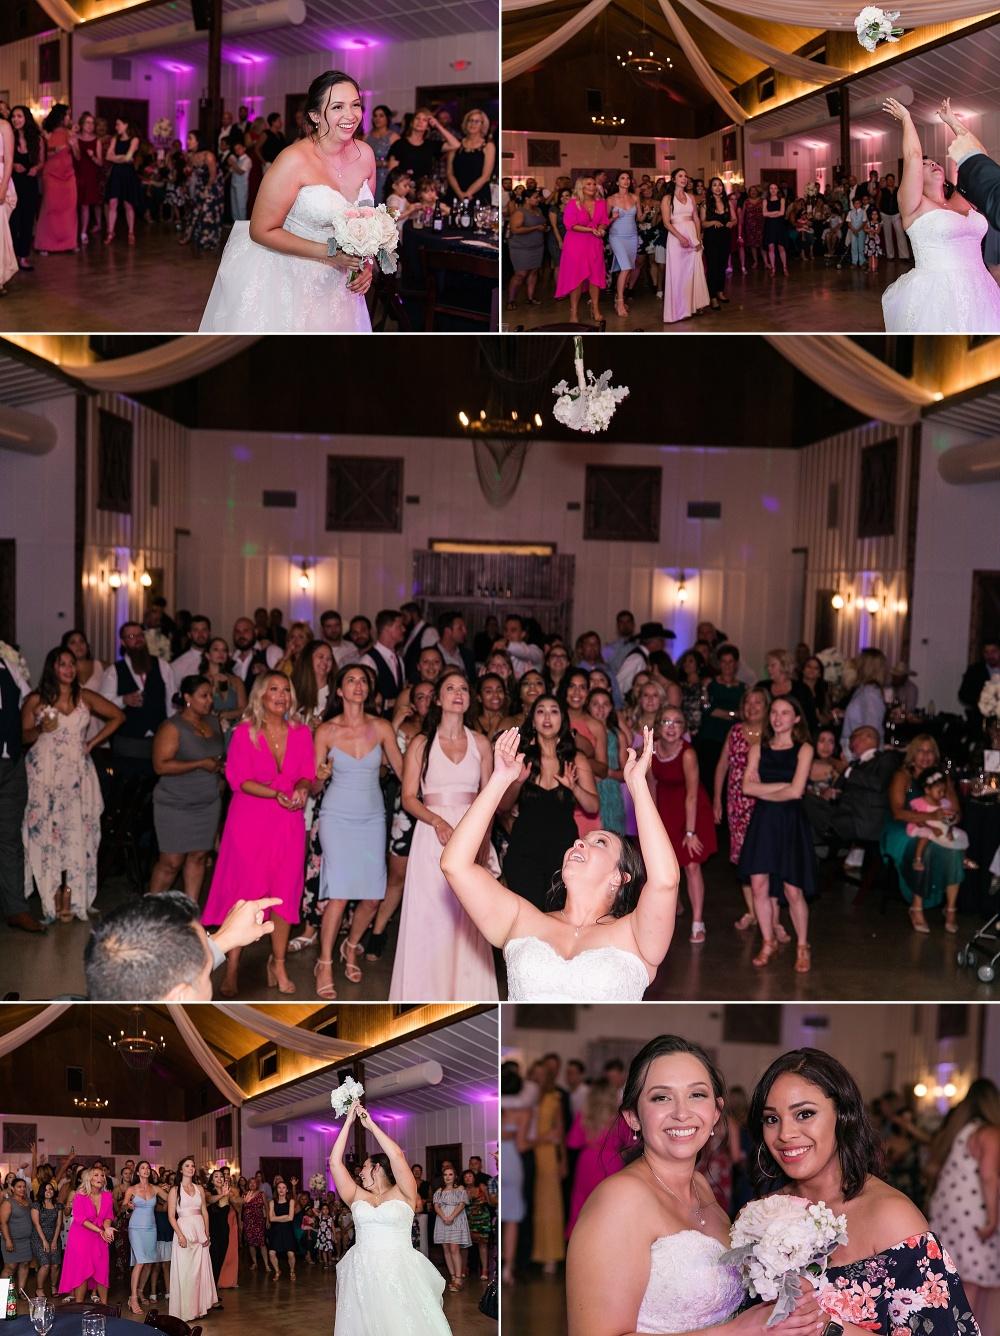 Wedding-Photographer-Bulverde-Texas-Western-Sky-Event-Venue-Carly-Barton-Photography_0088.jpg